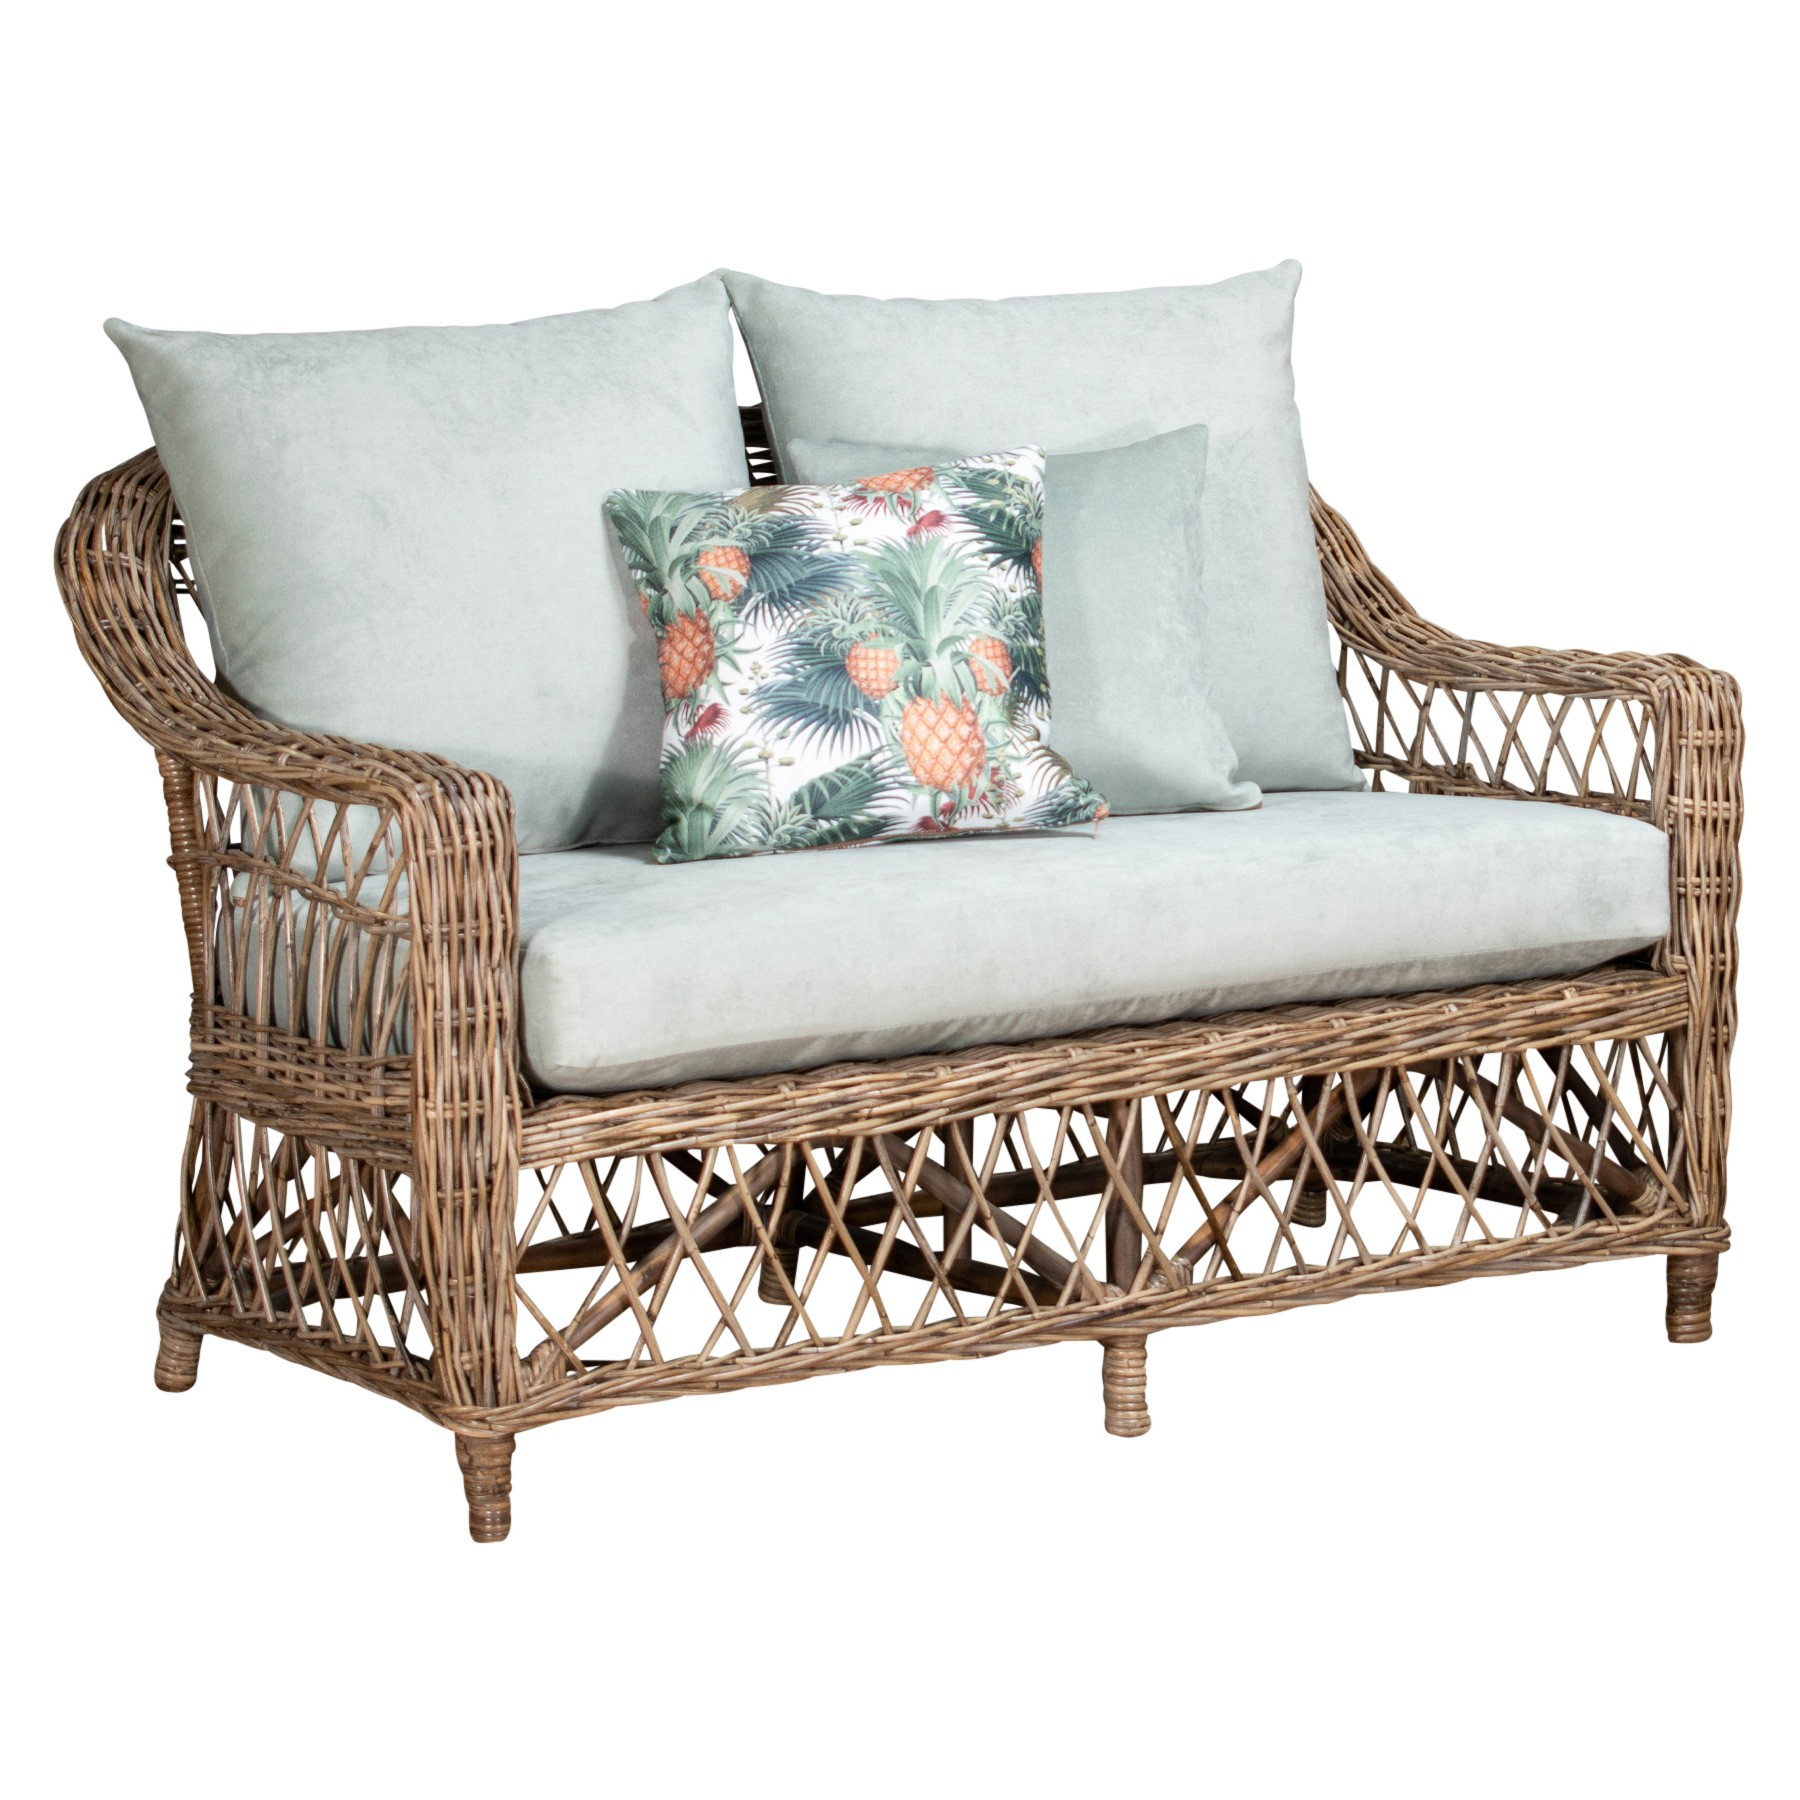 Nassau Rattan Sofa, 2 Seater, Natural / Seafoam